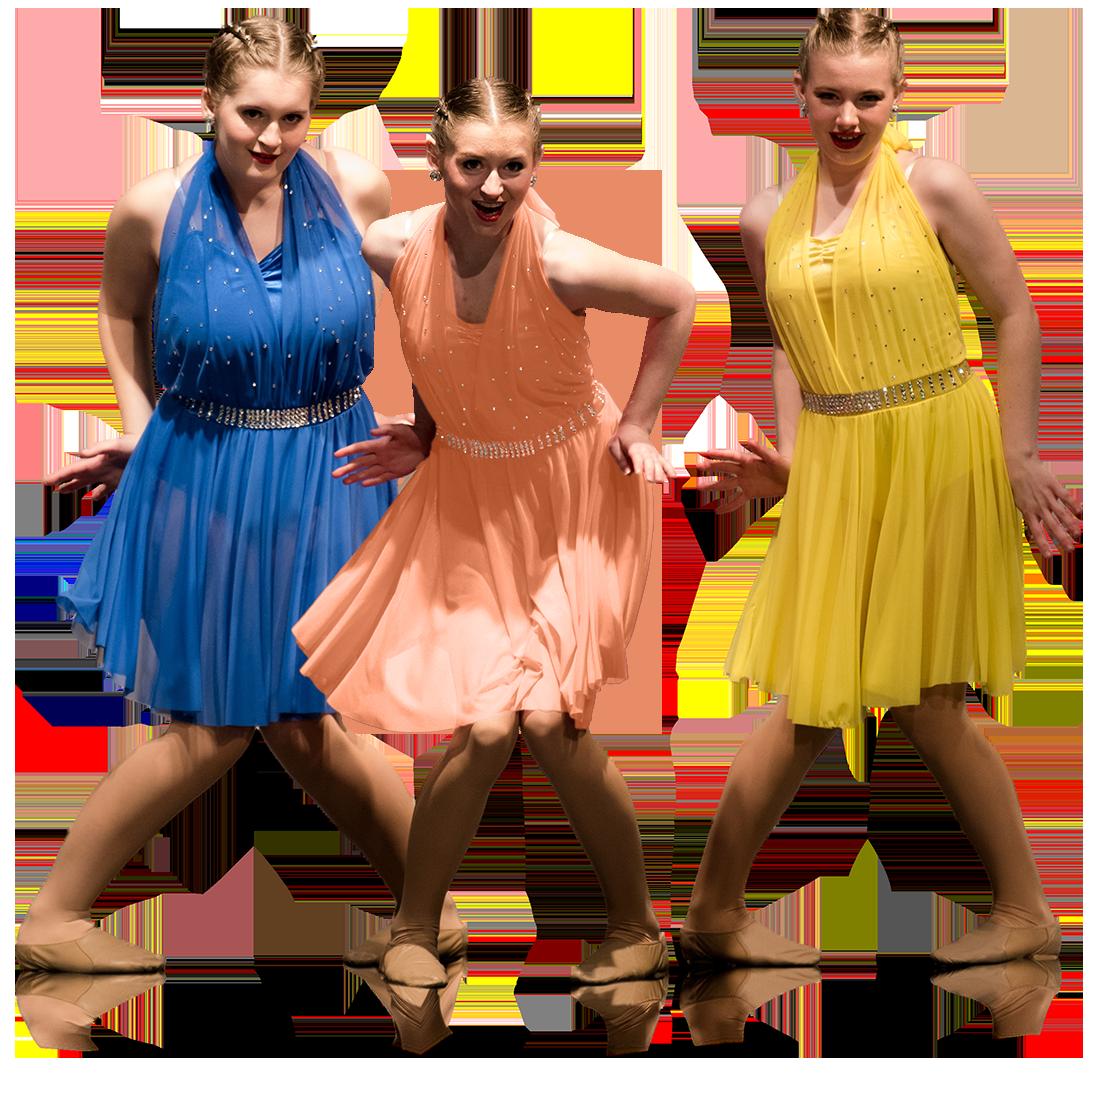 Three dancers in bright colored dresses.